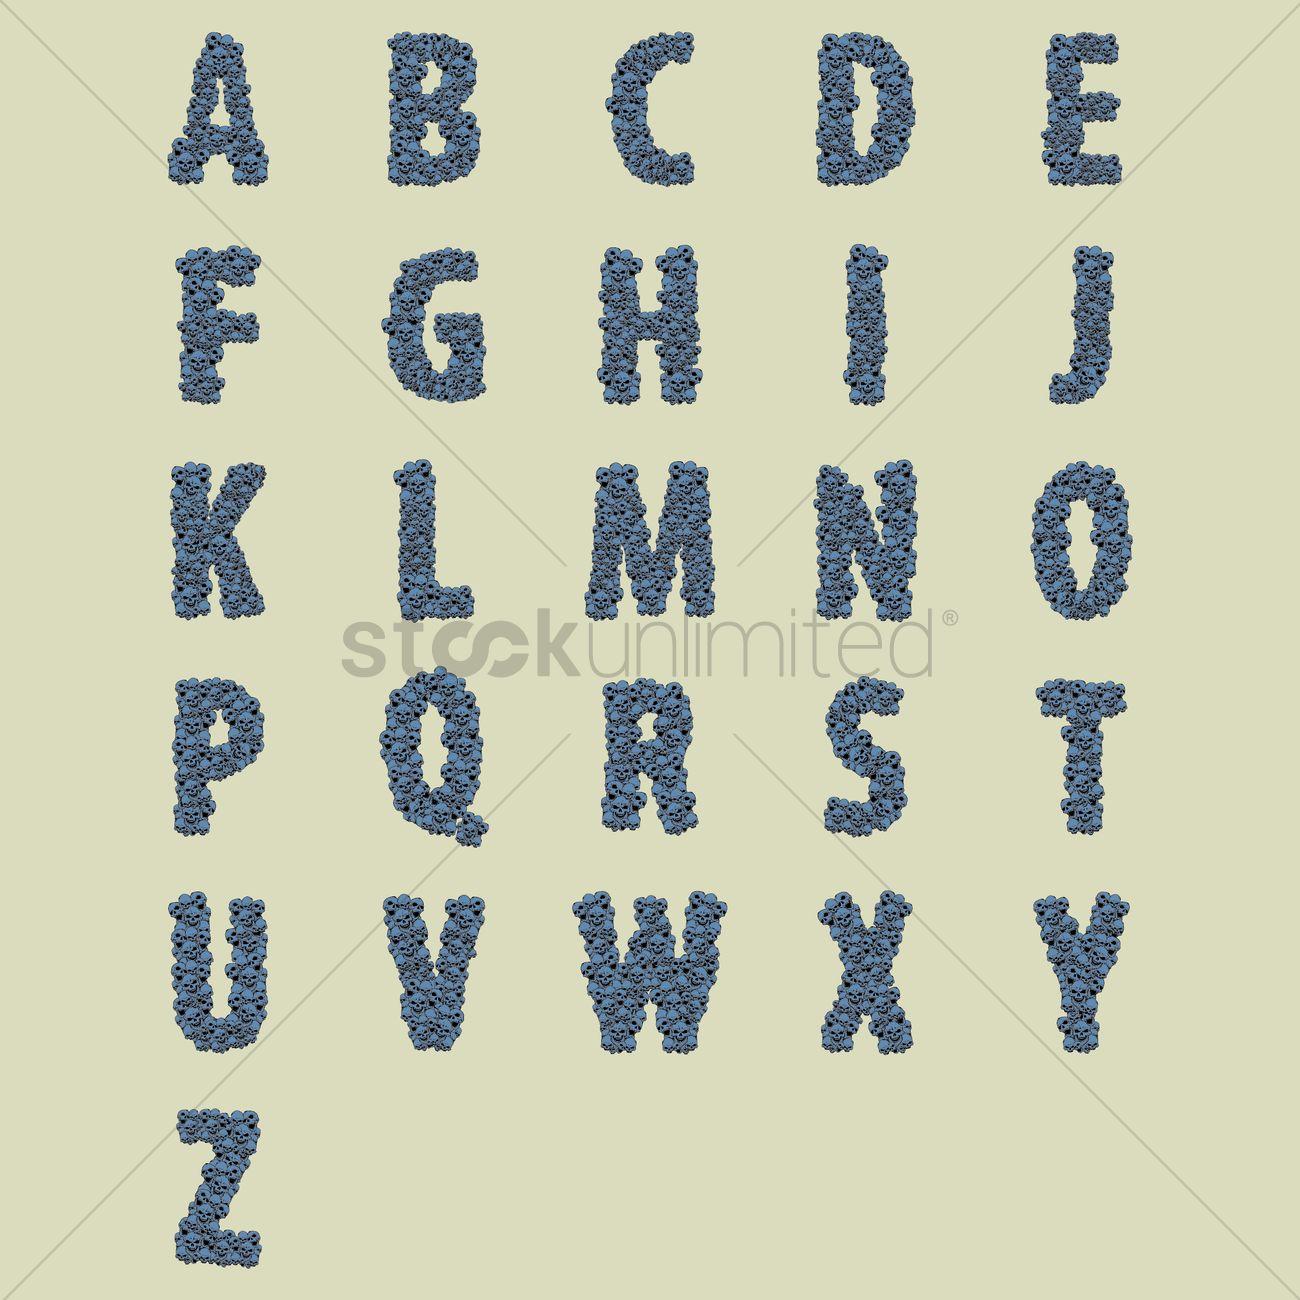 Capital Letter Alphabets In Skulls Design Vector Image 1467873